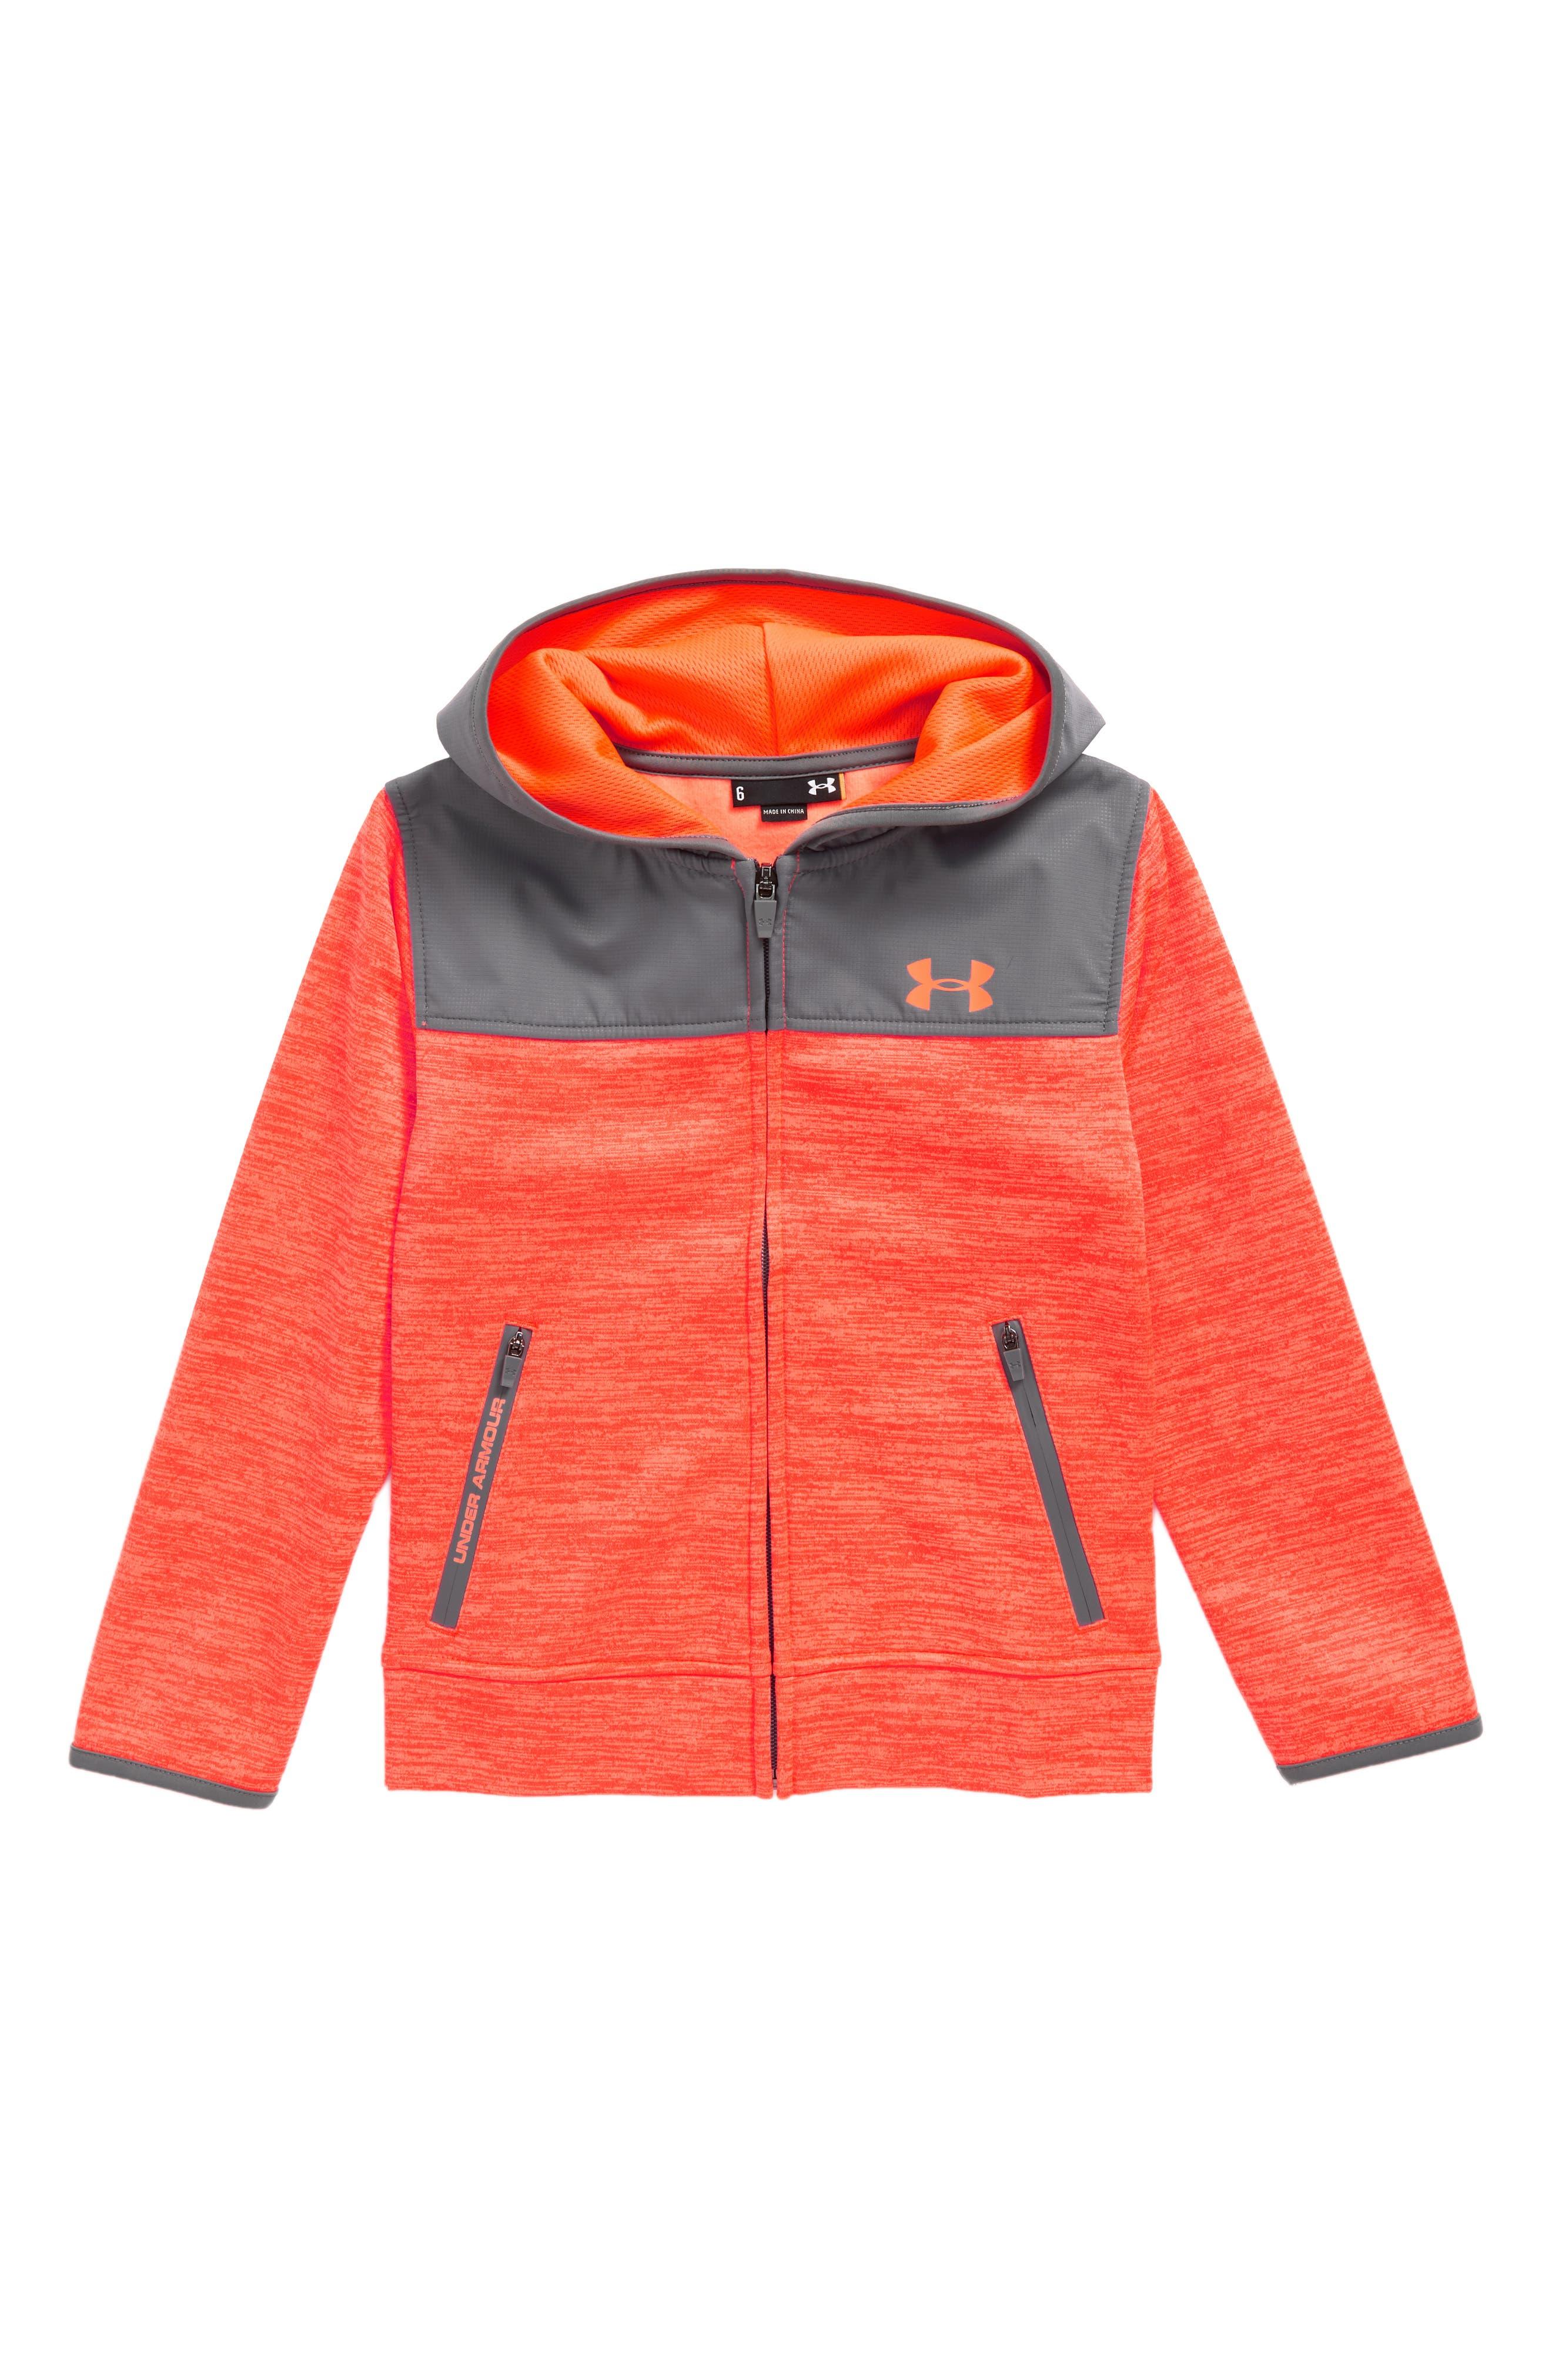 Altitude Hoodie,                         Main,                         color, Magma Orange